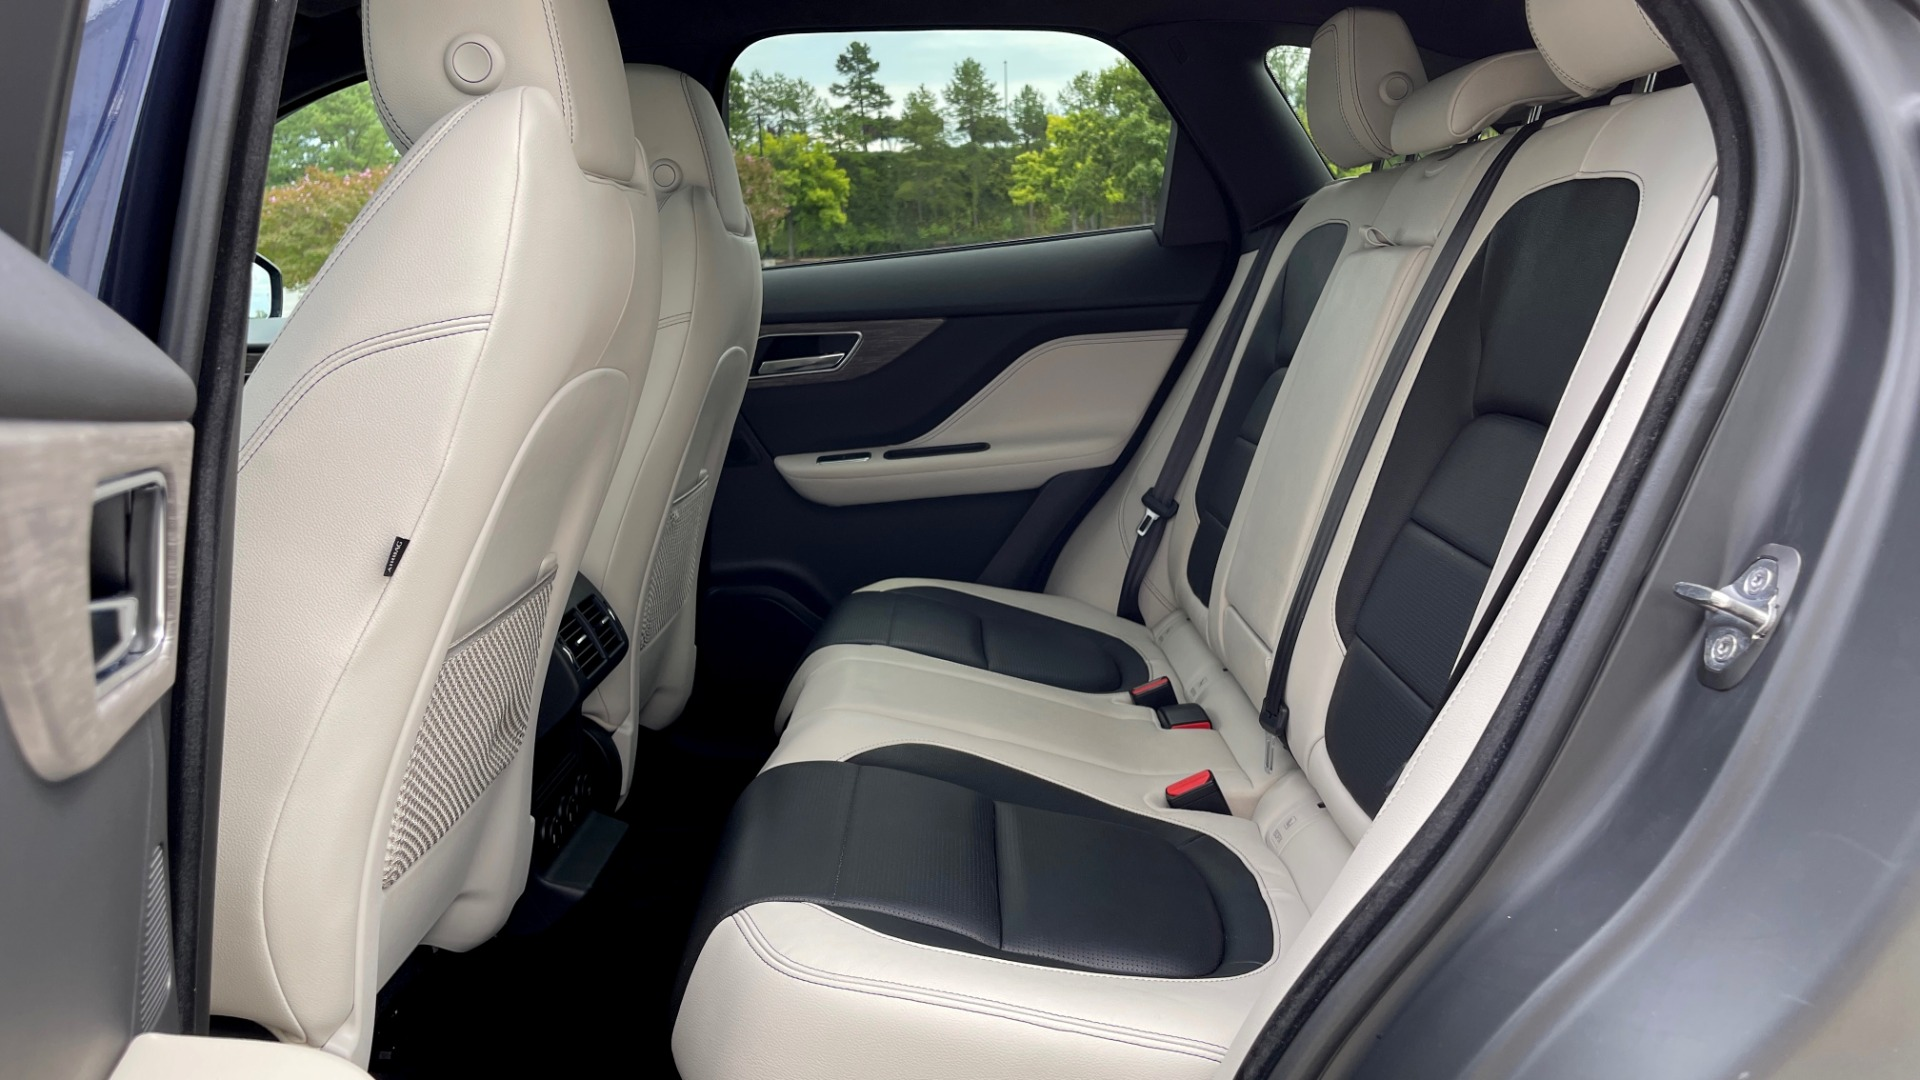 Used 2019 Jaguar F-PACE S / DRIVE PKG / BSA / HUD / BLACK EXT PKG / REARVIEW for sale $50,995 at Formula Imports in Charlotte NC 28227 51